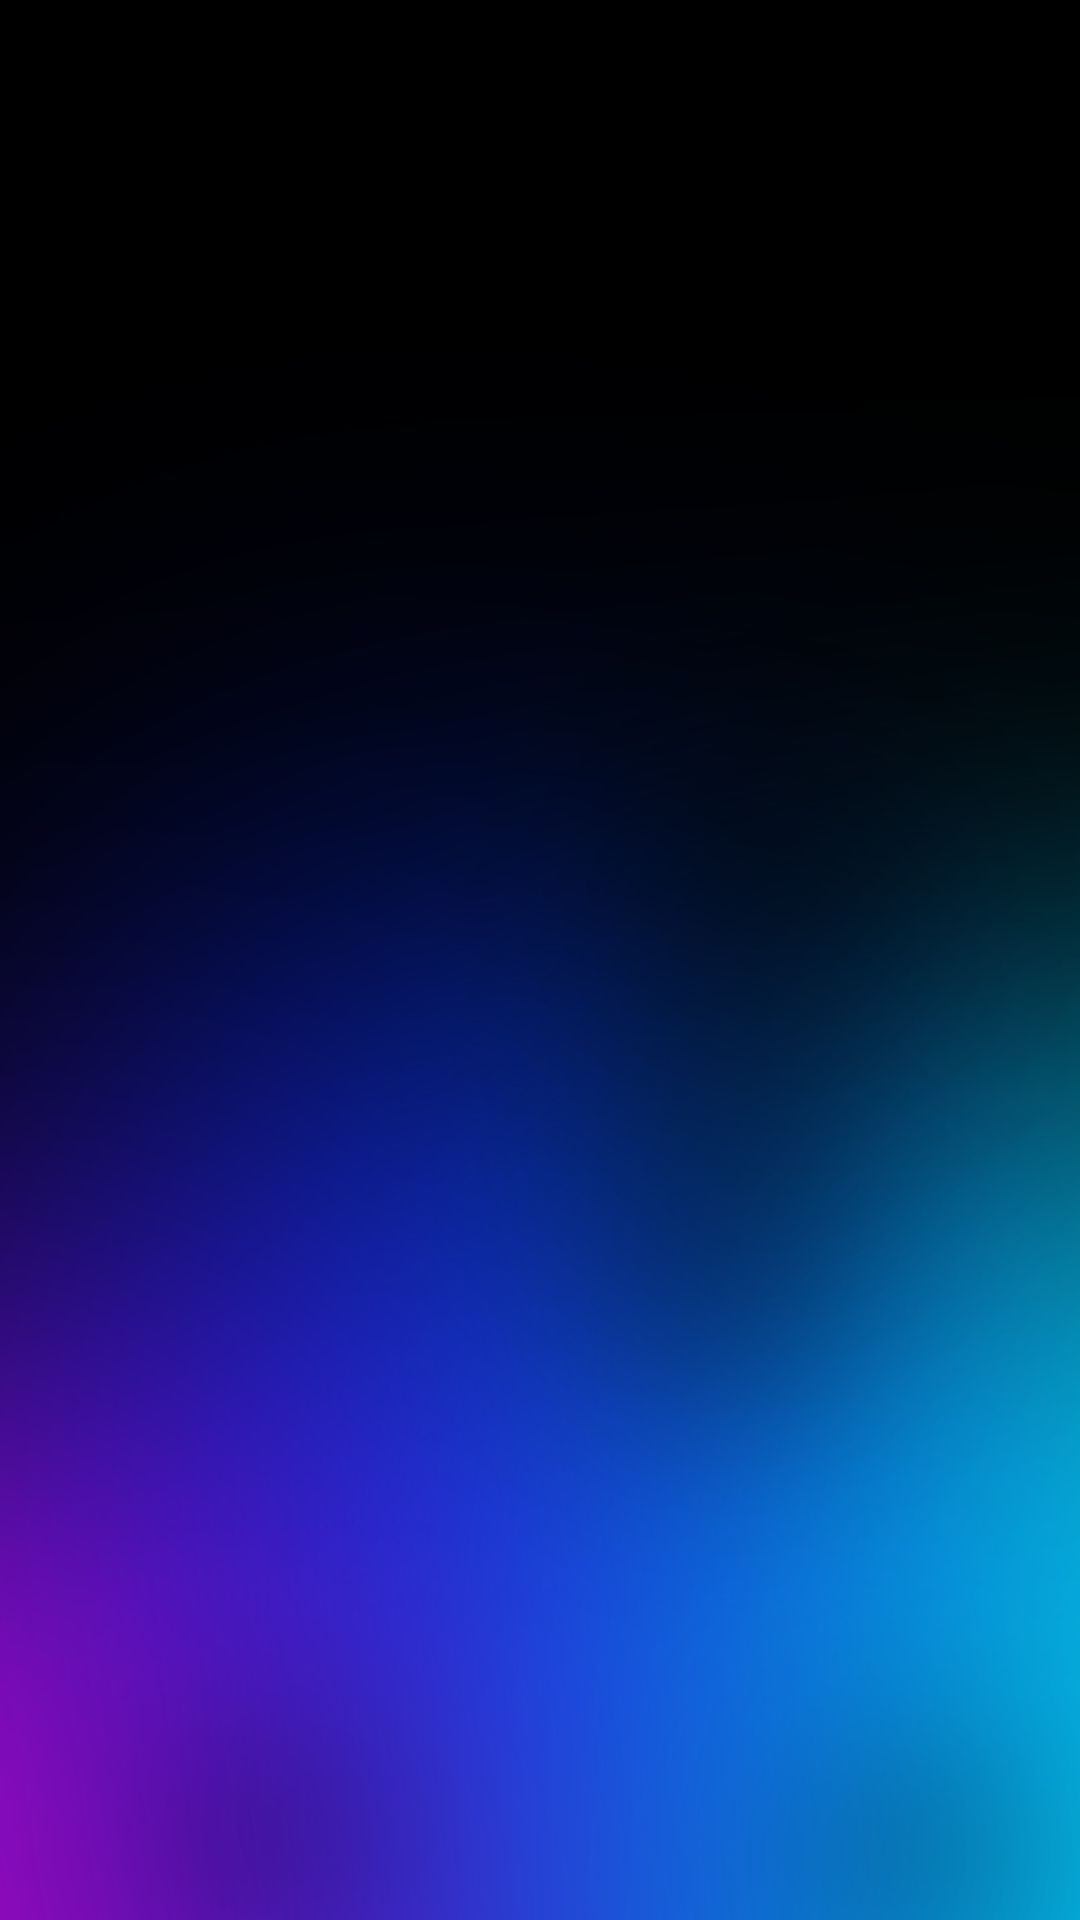 Aesthetic Dark Blue Background In 2020 Blue Wallpaper Iphone Iphone Wallpaper Bright Dark Wallpaper Iphone